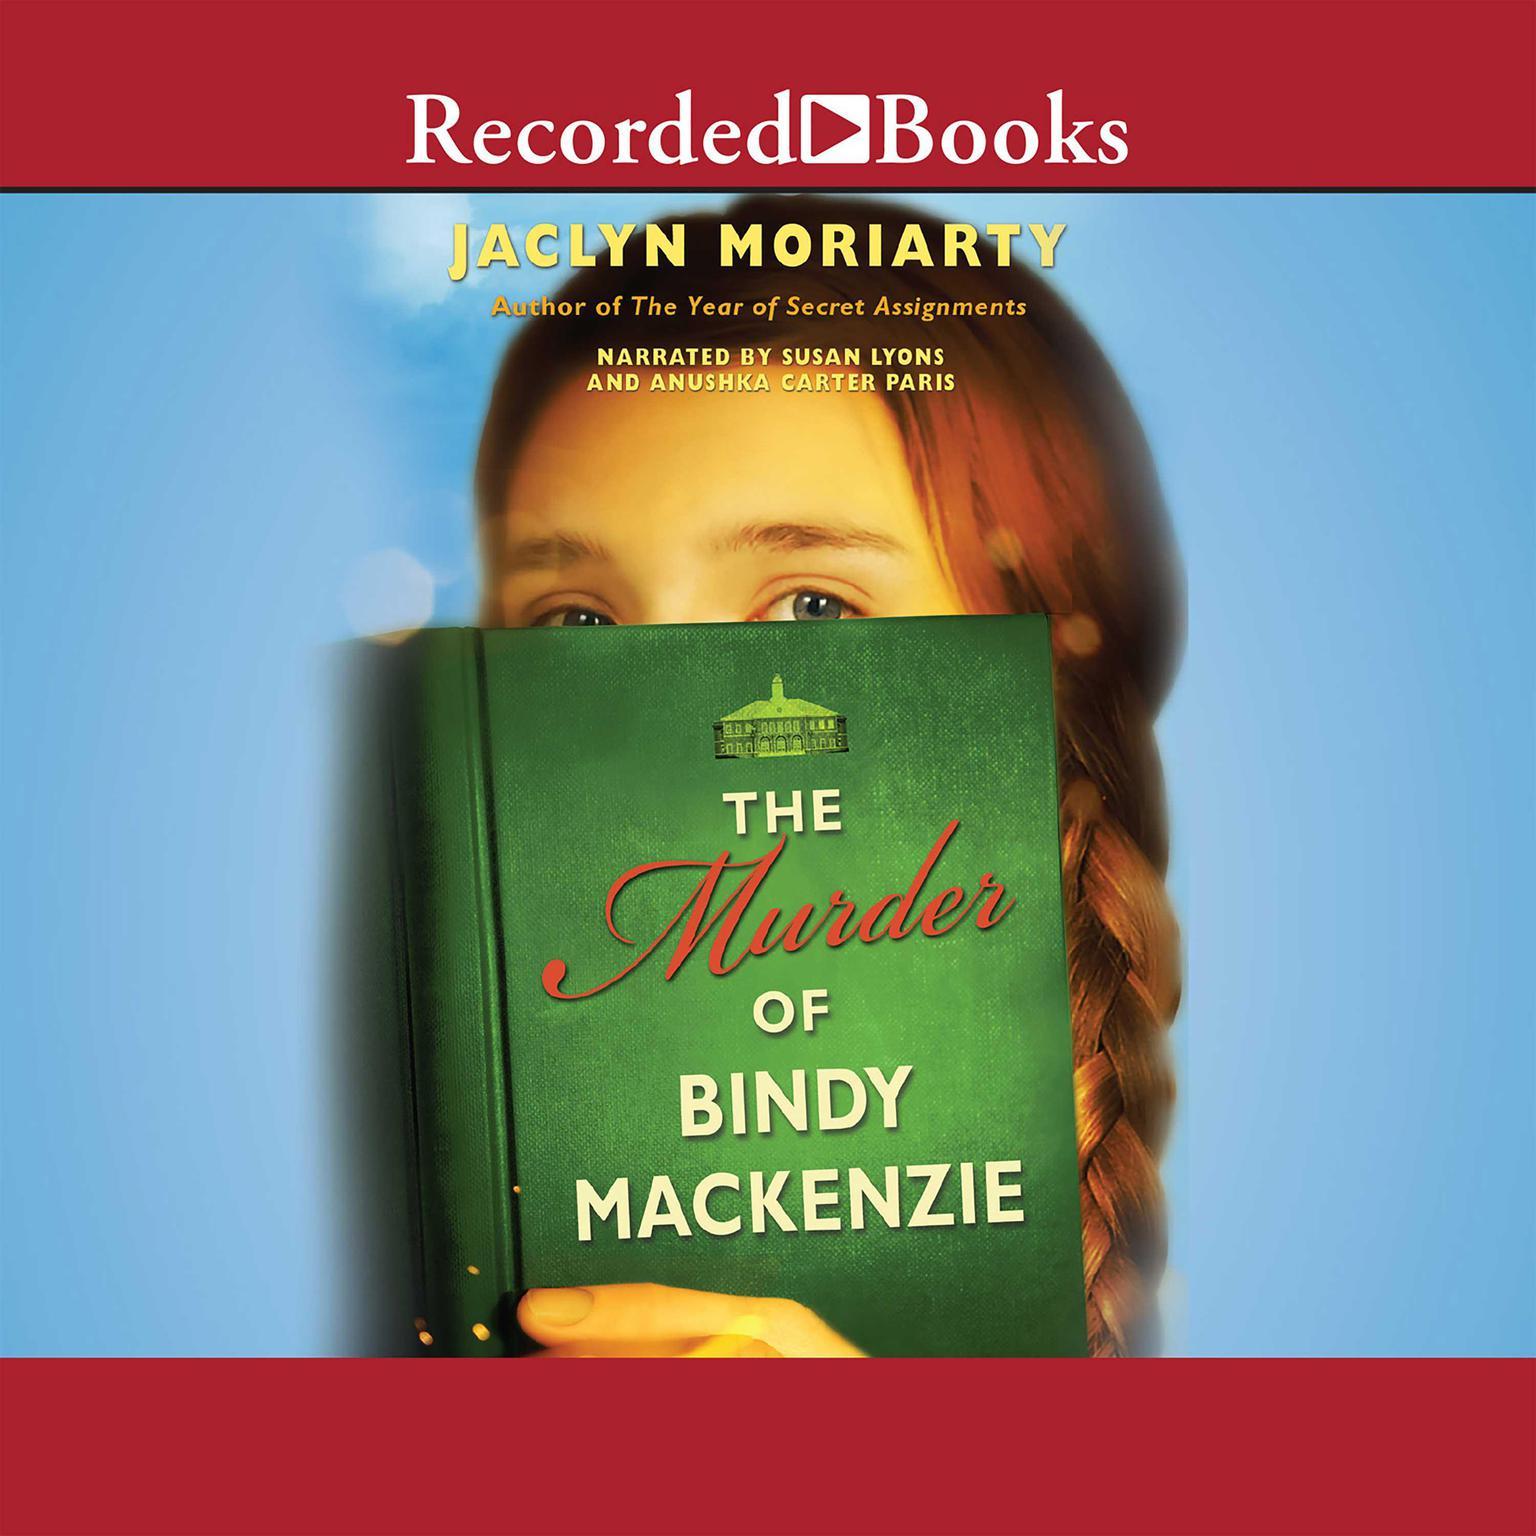 The Murder of Bindy Mackenzie Audiobook, by Jaclyn Moriarty